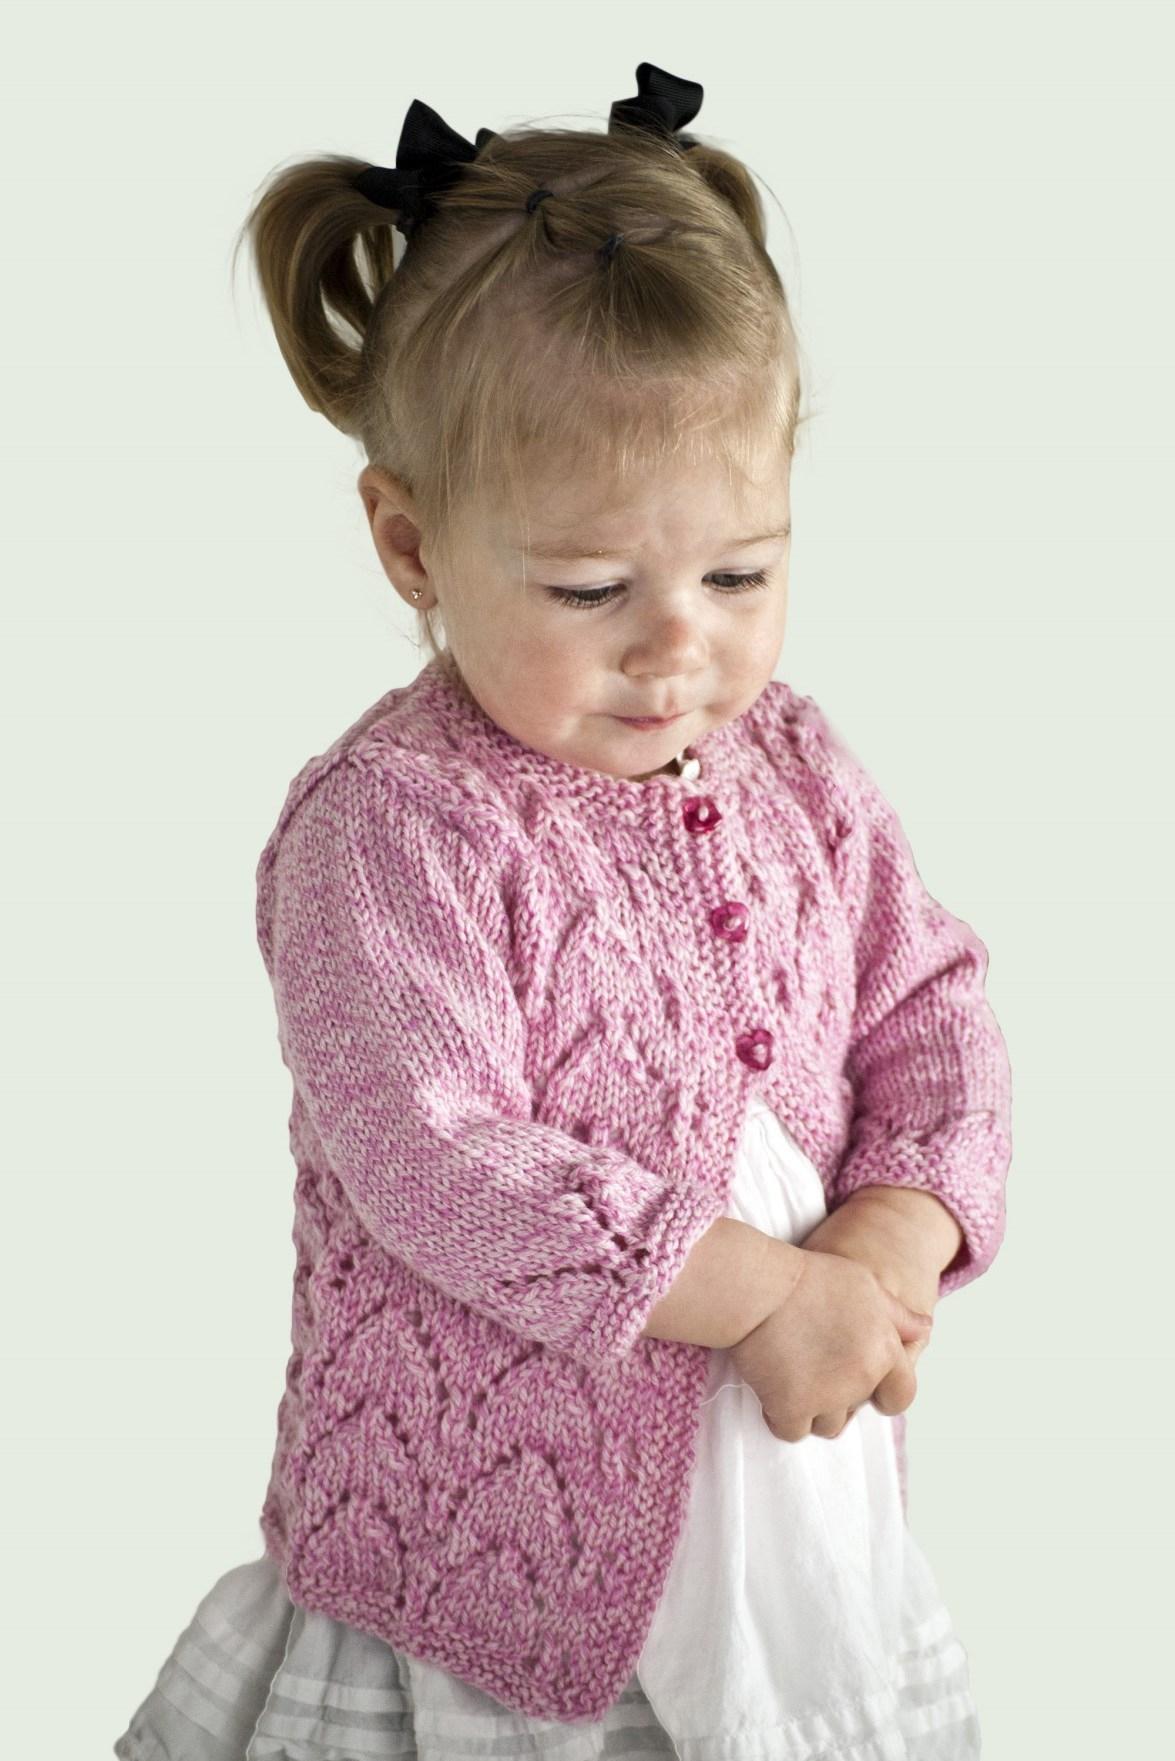 Aran Knitting Patterns Free 3 Free Valentines Sweaters Knitting Patterns Loveknitting Blog